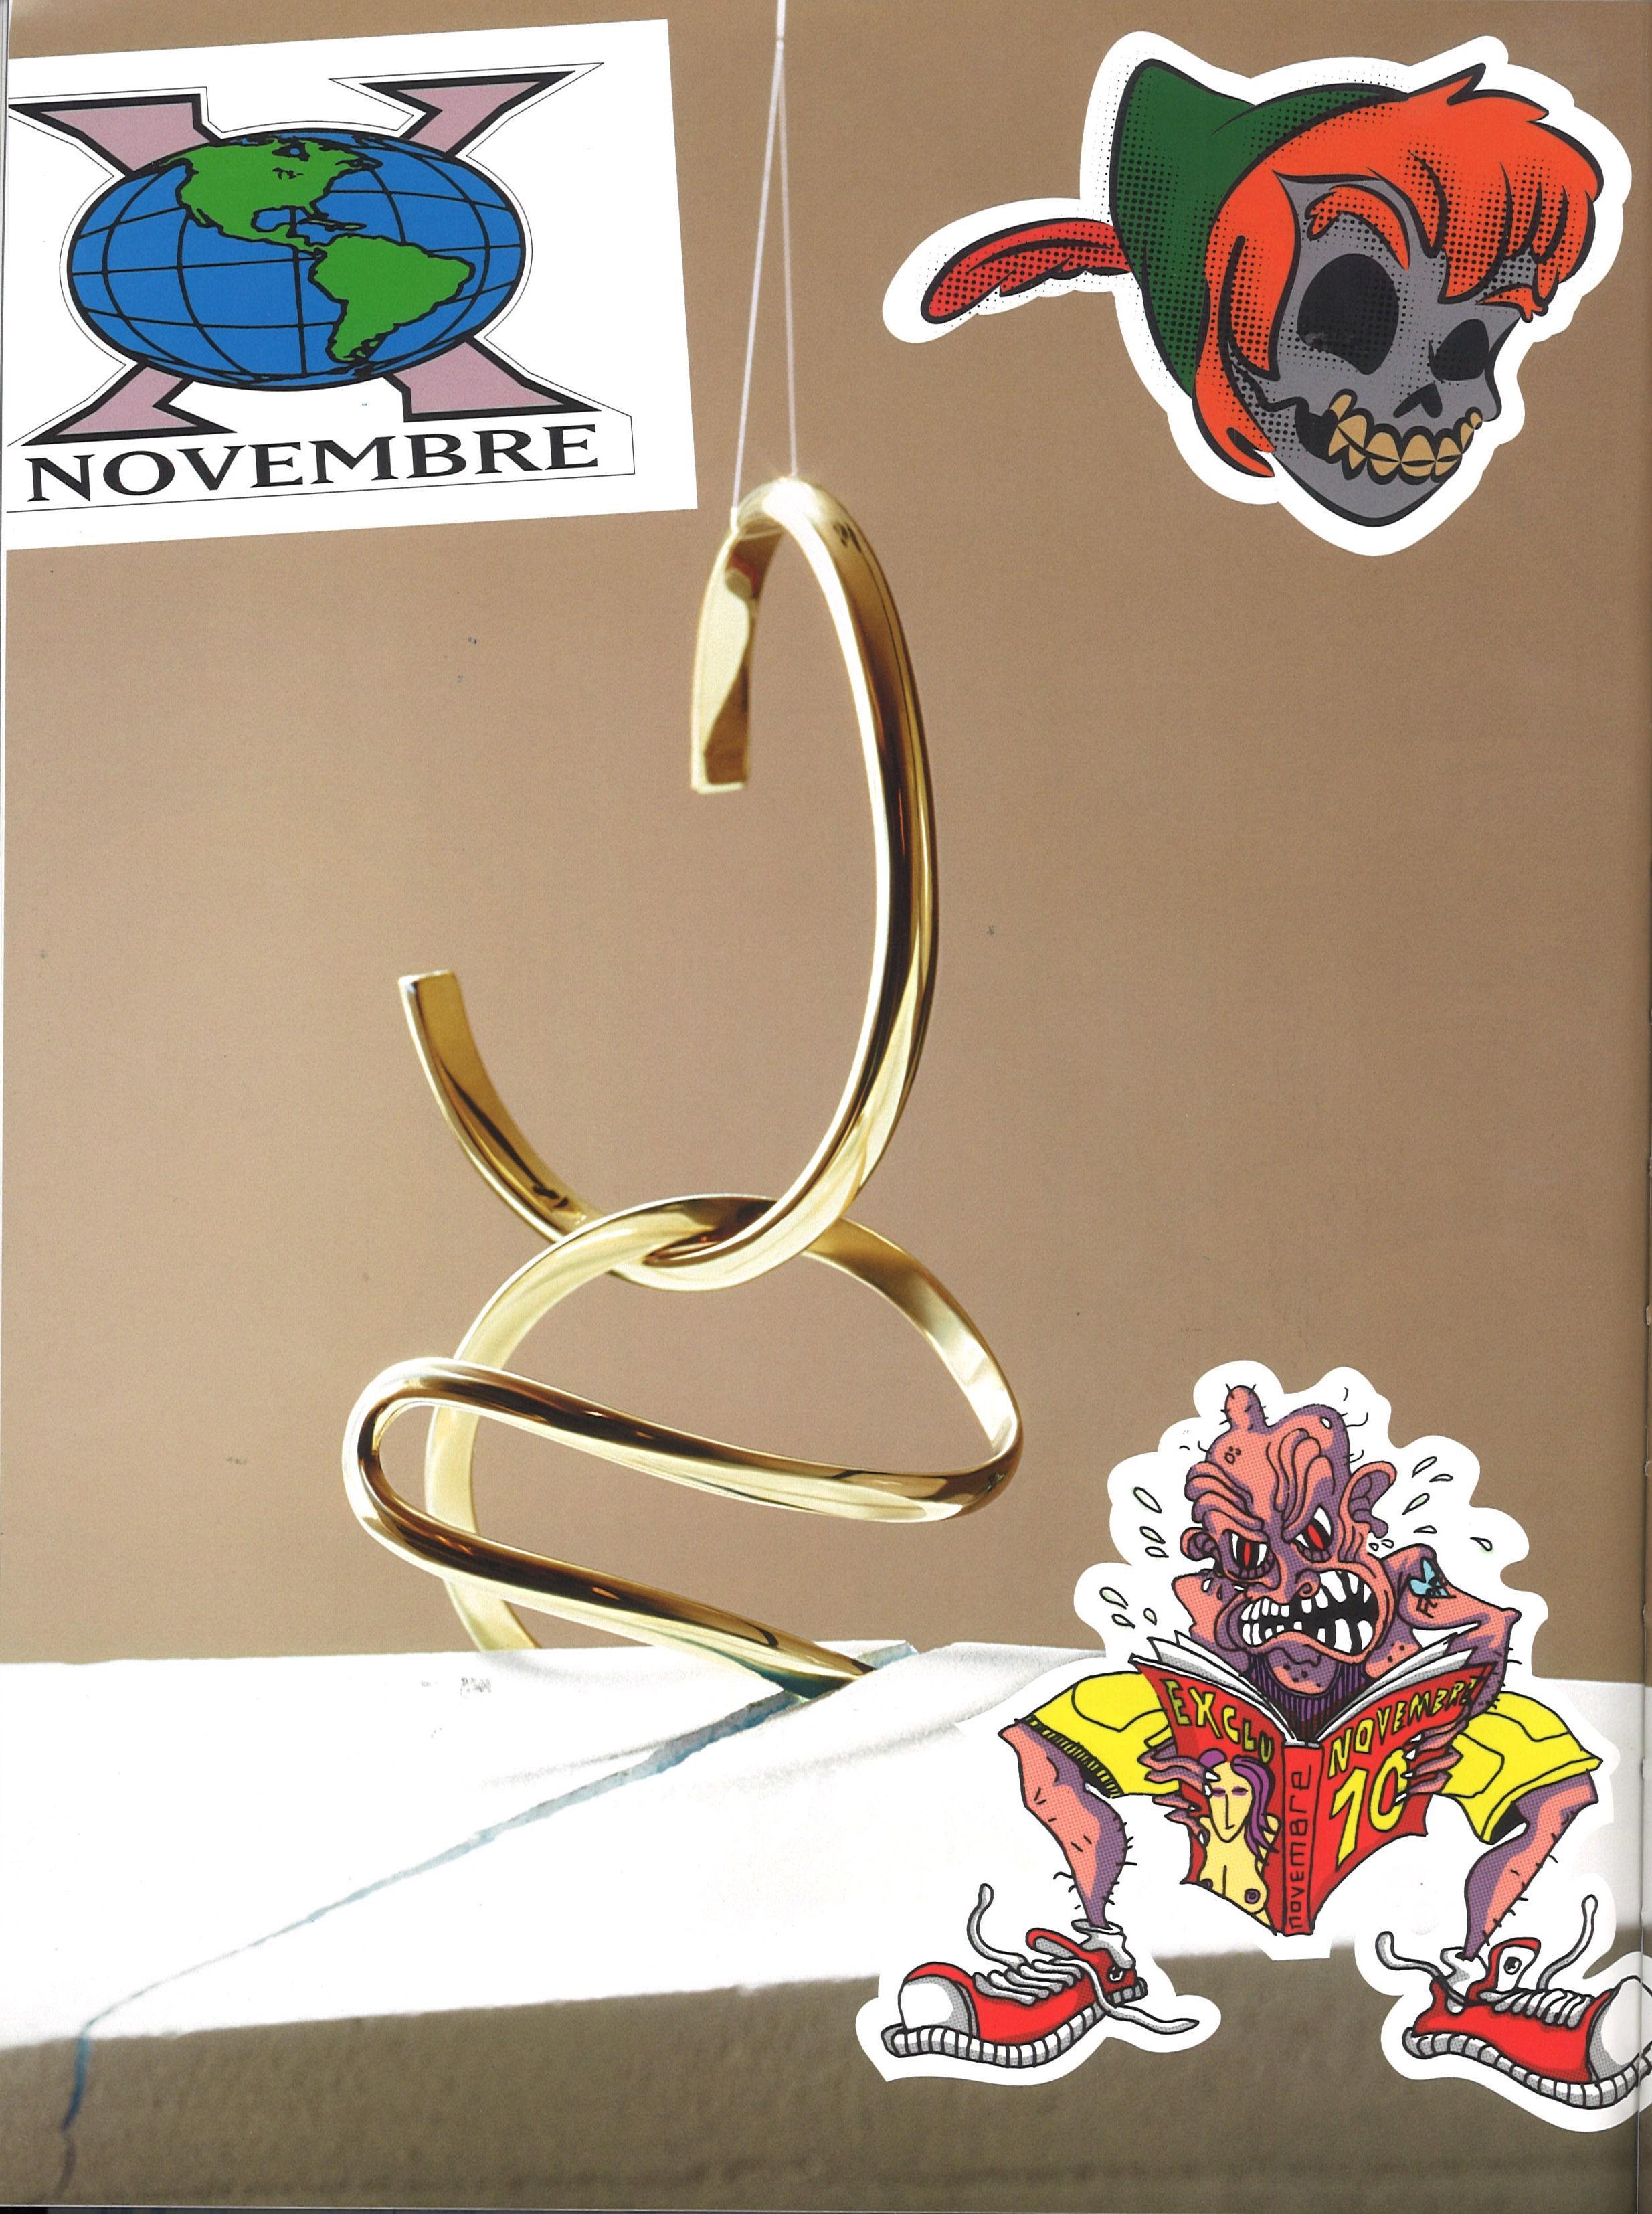 Novembre1